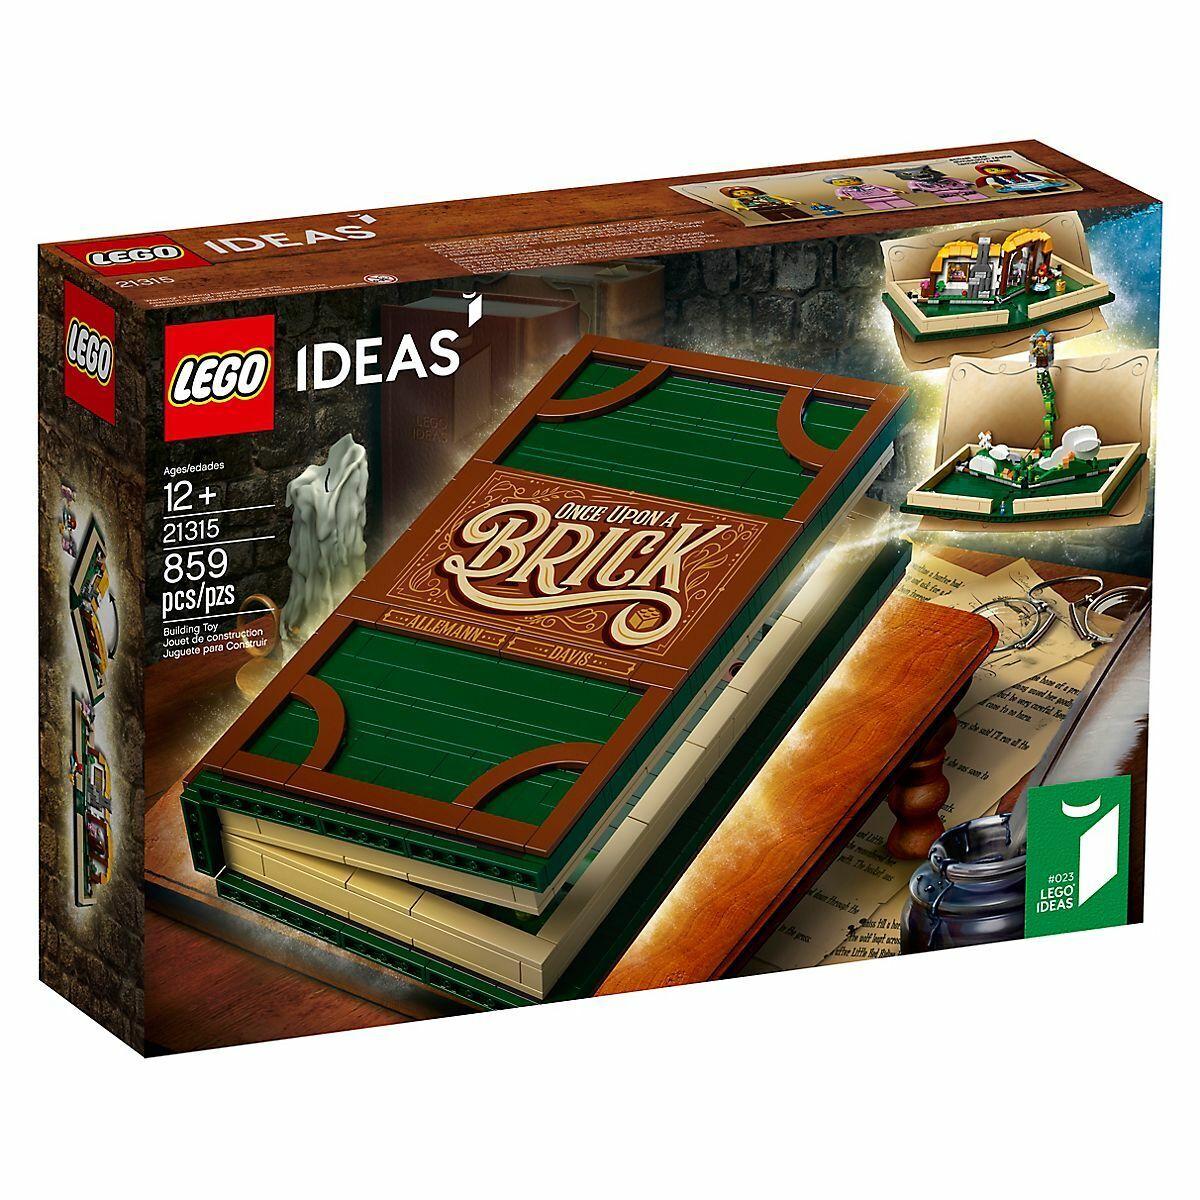 LEGO 21315 Popp-up - iDEAS 12 Pz 859